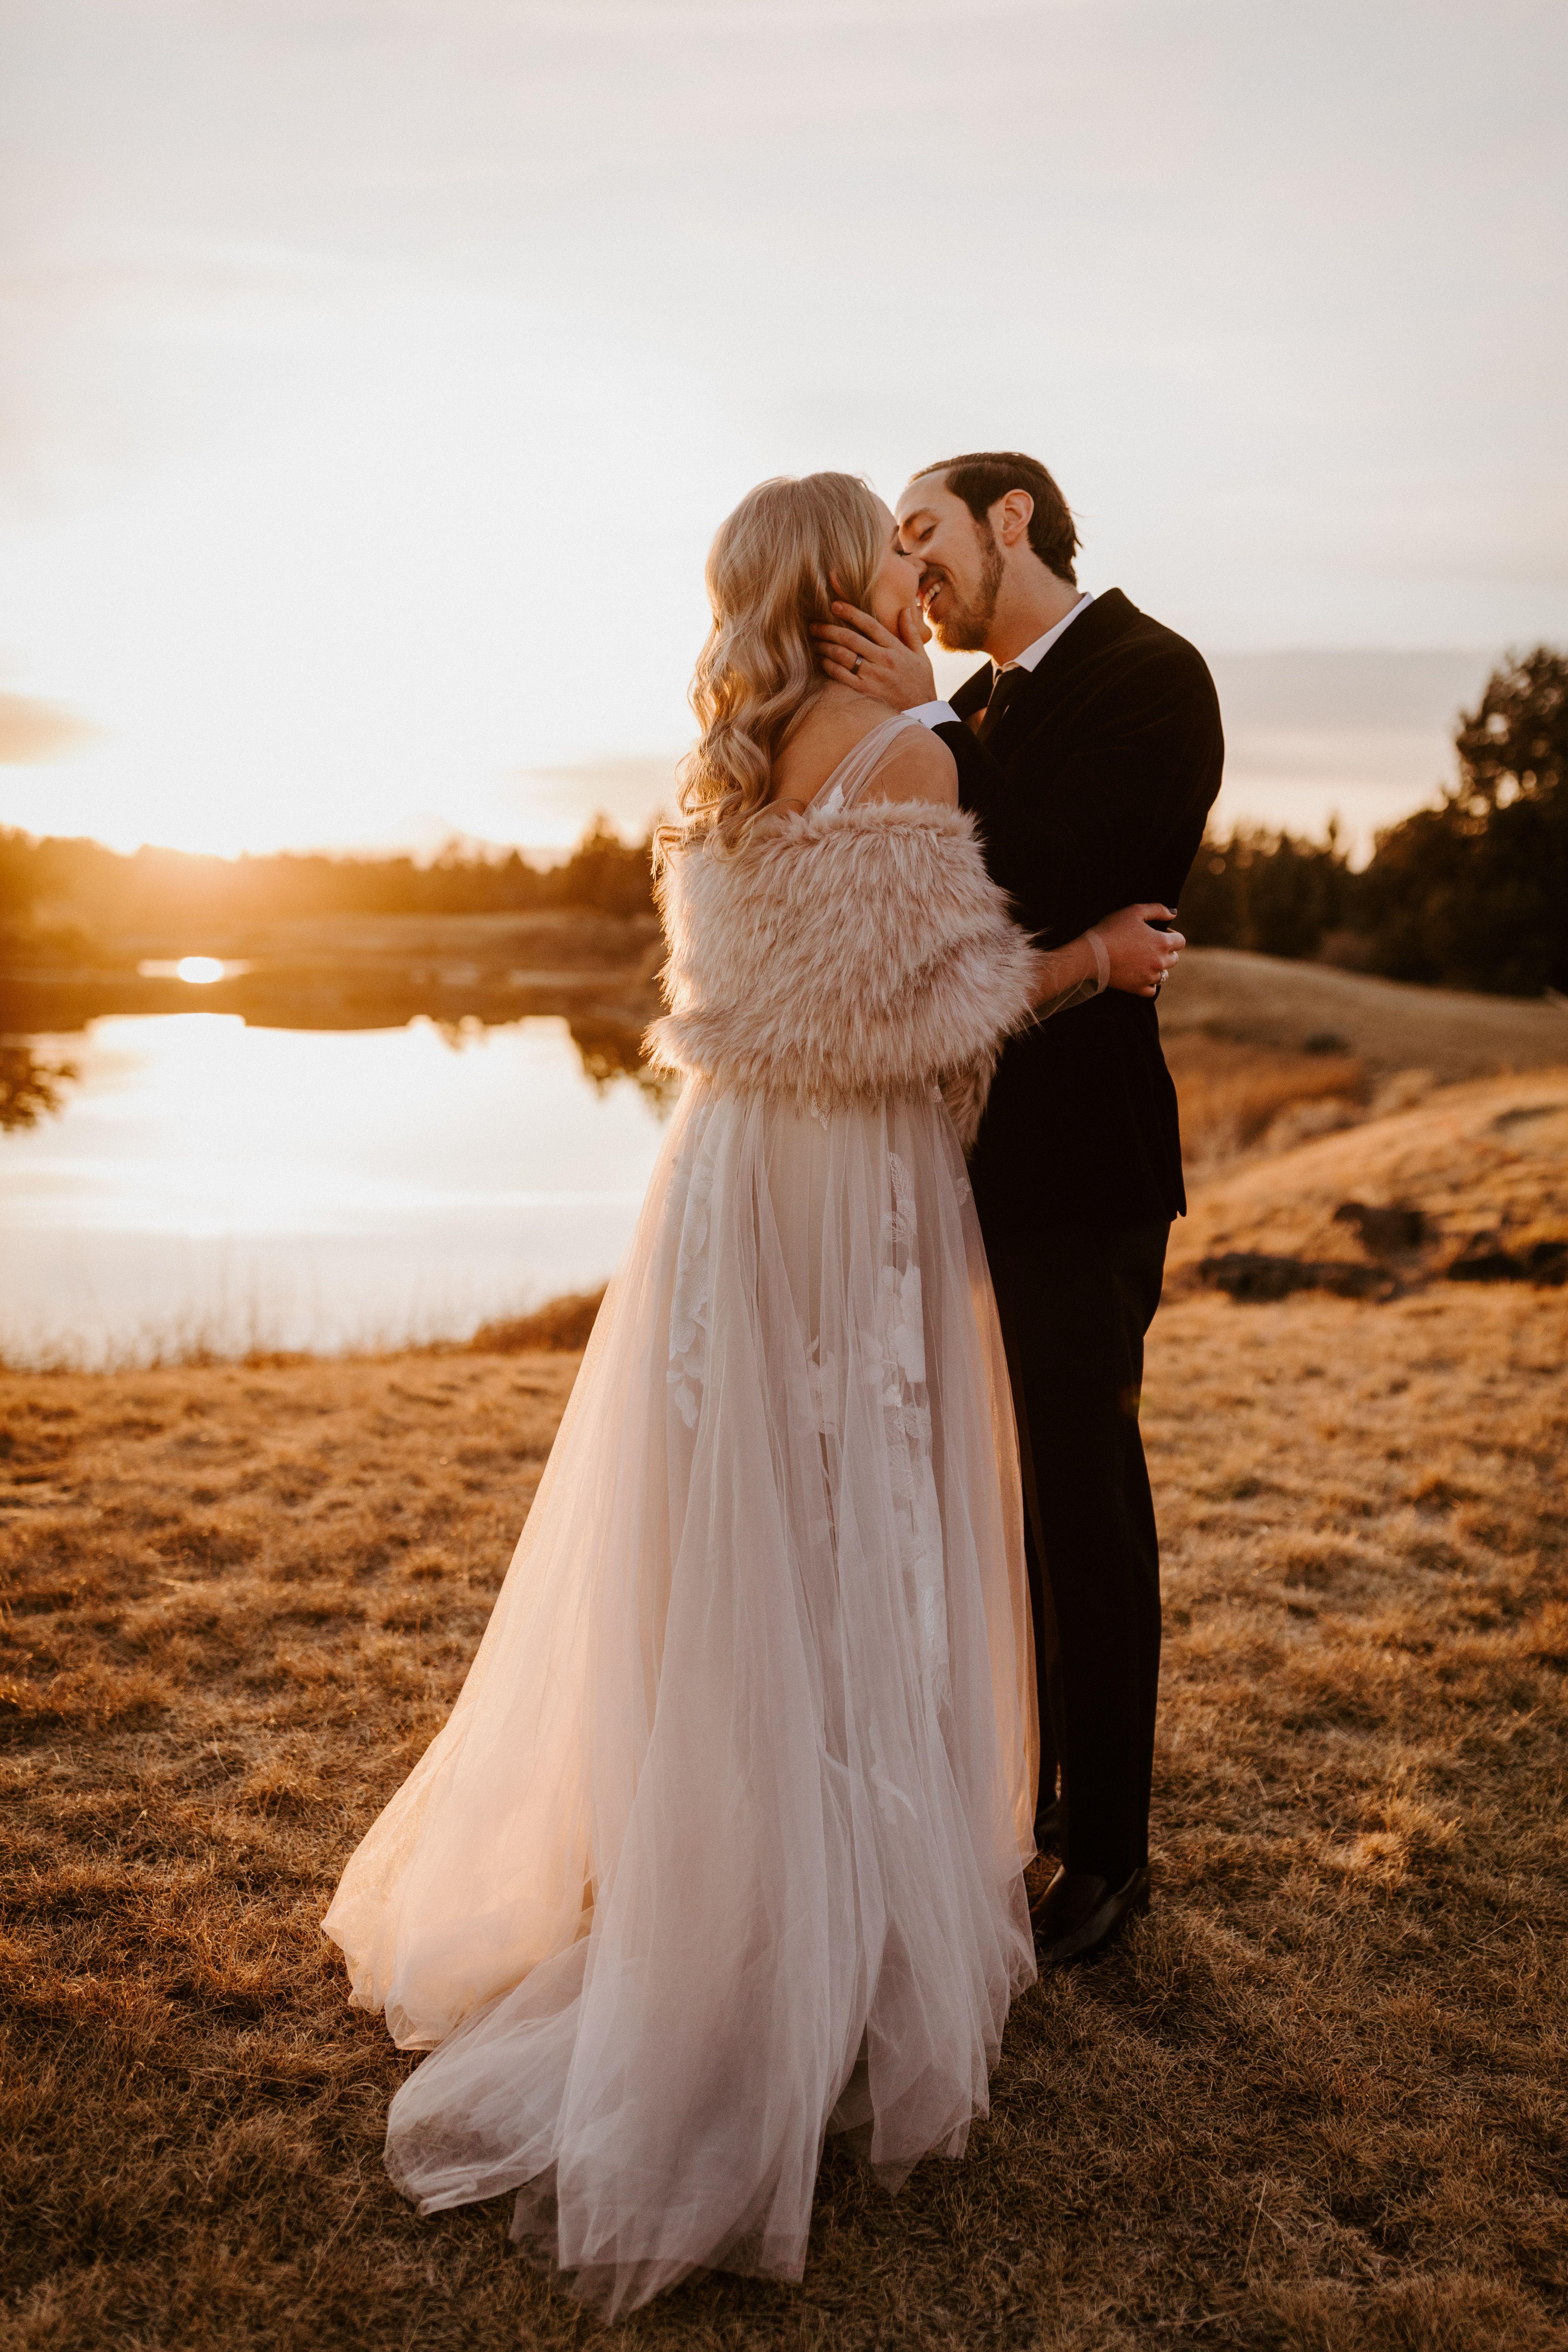 Winter Wedding At Pronghorn Resort In 2020 Winter Wedding Wedding Oregon Winter